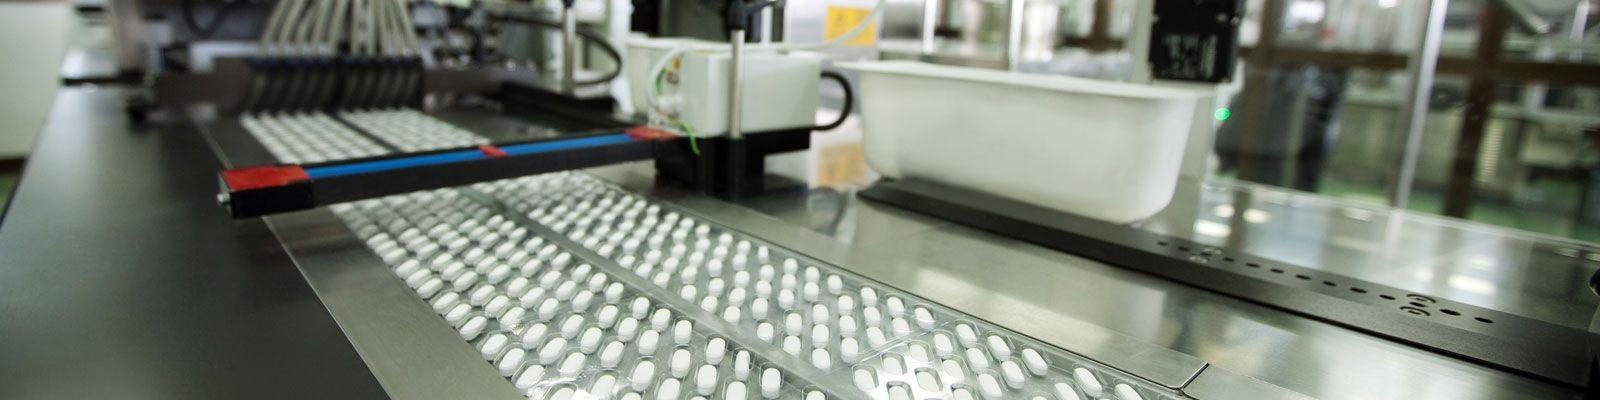 Production Line Automation